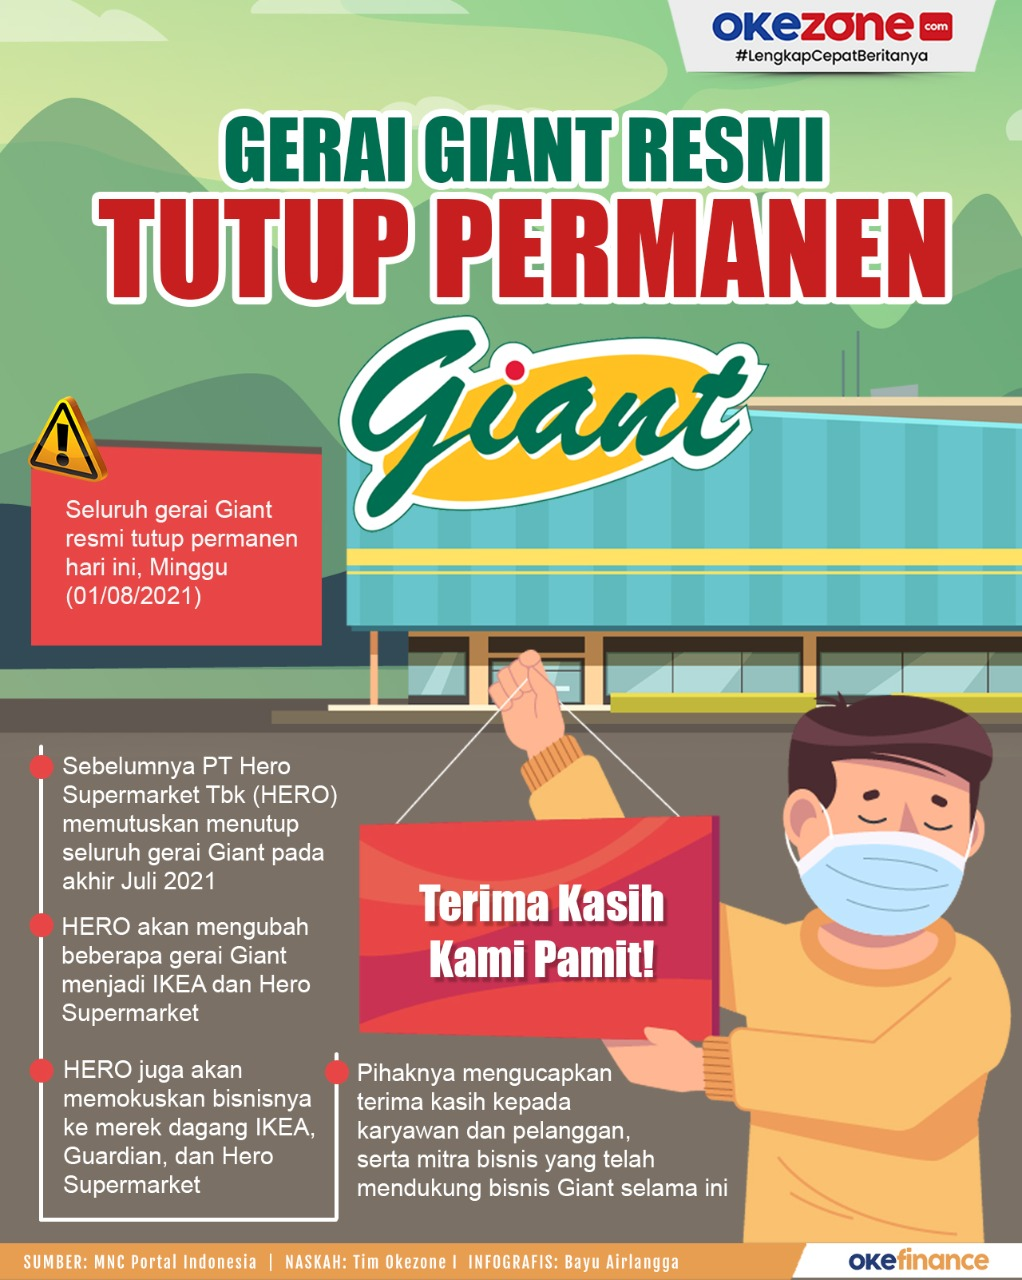 Gerai Giant Resmi Tutup Permanen -